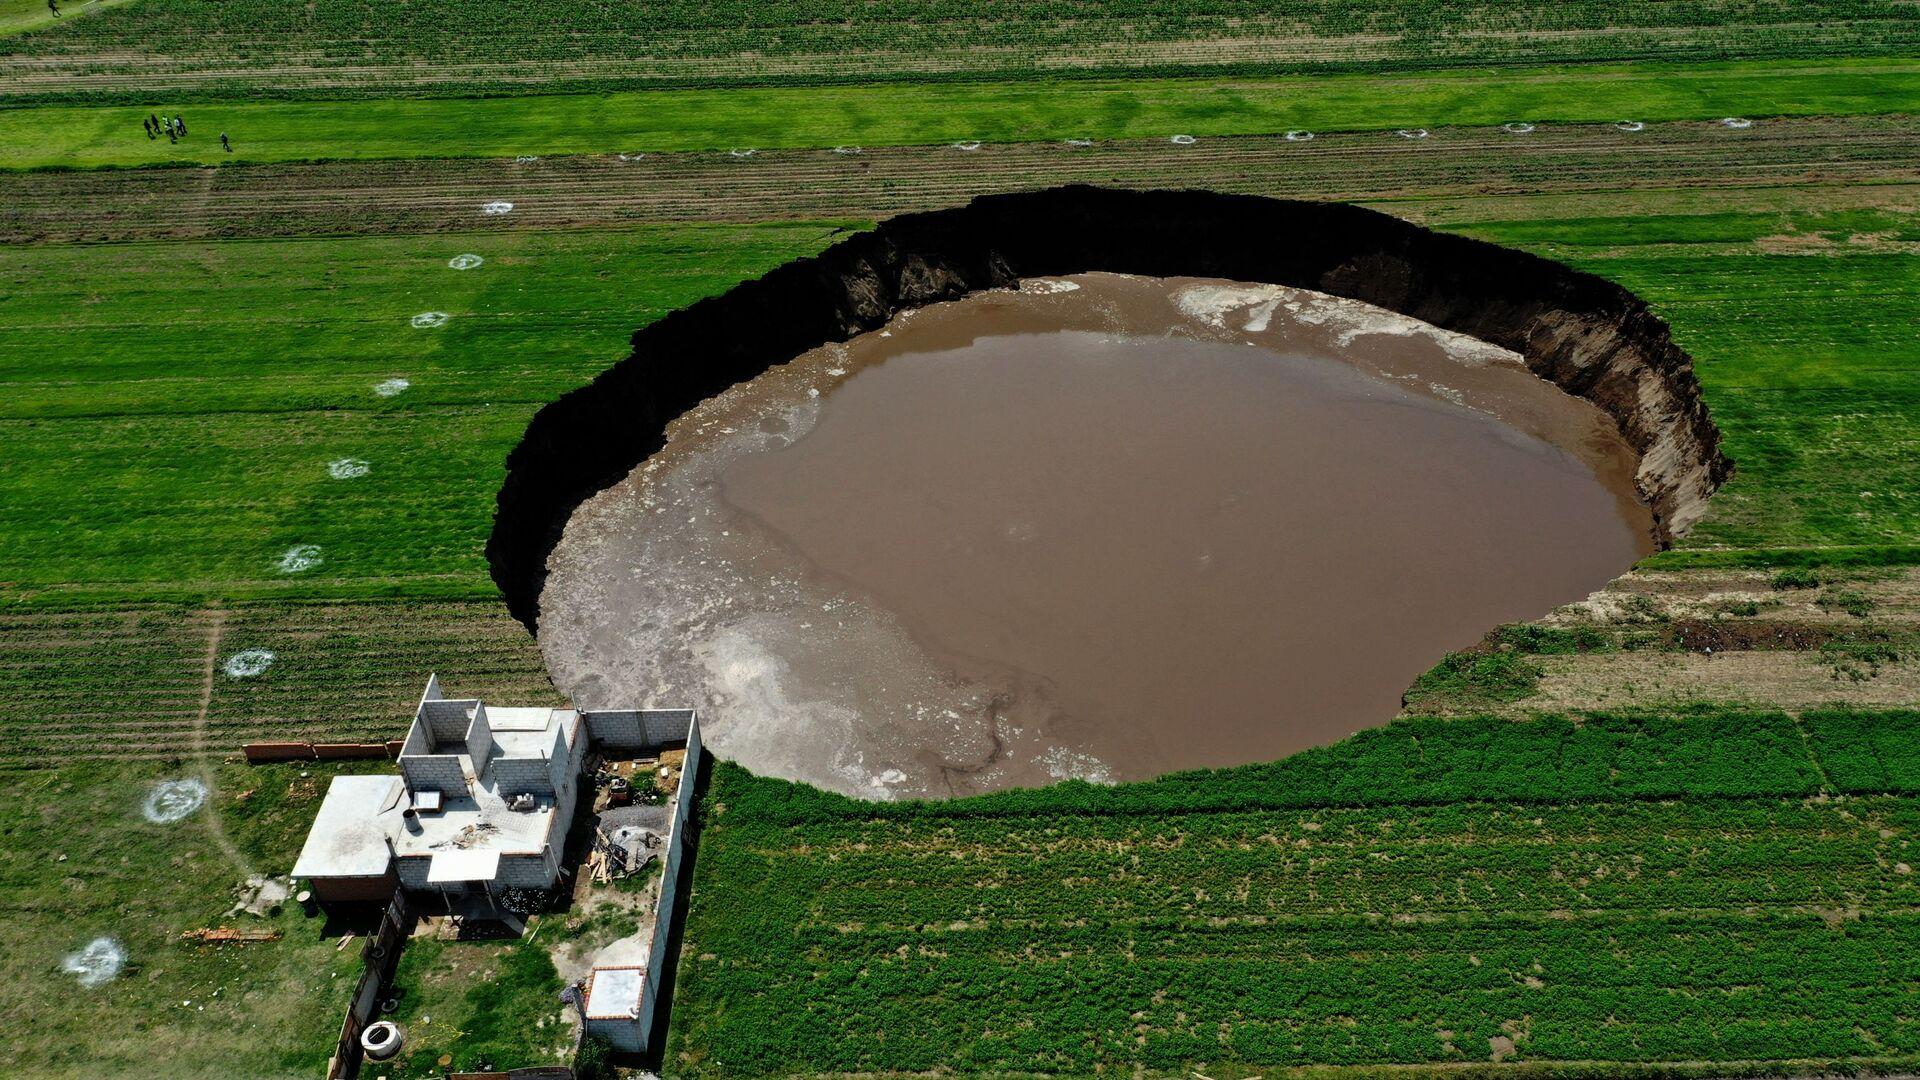 Obrovský kráter v Mexiku. - Sputnik Česká republika, 1920, 11.06.2021